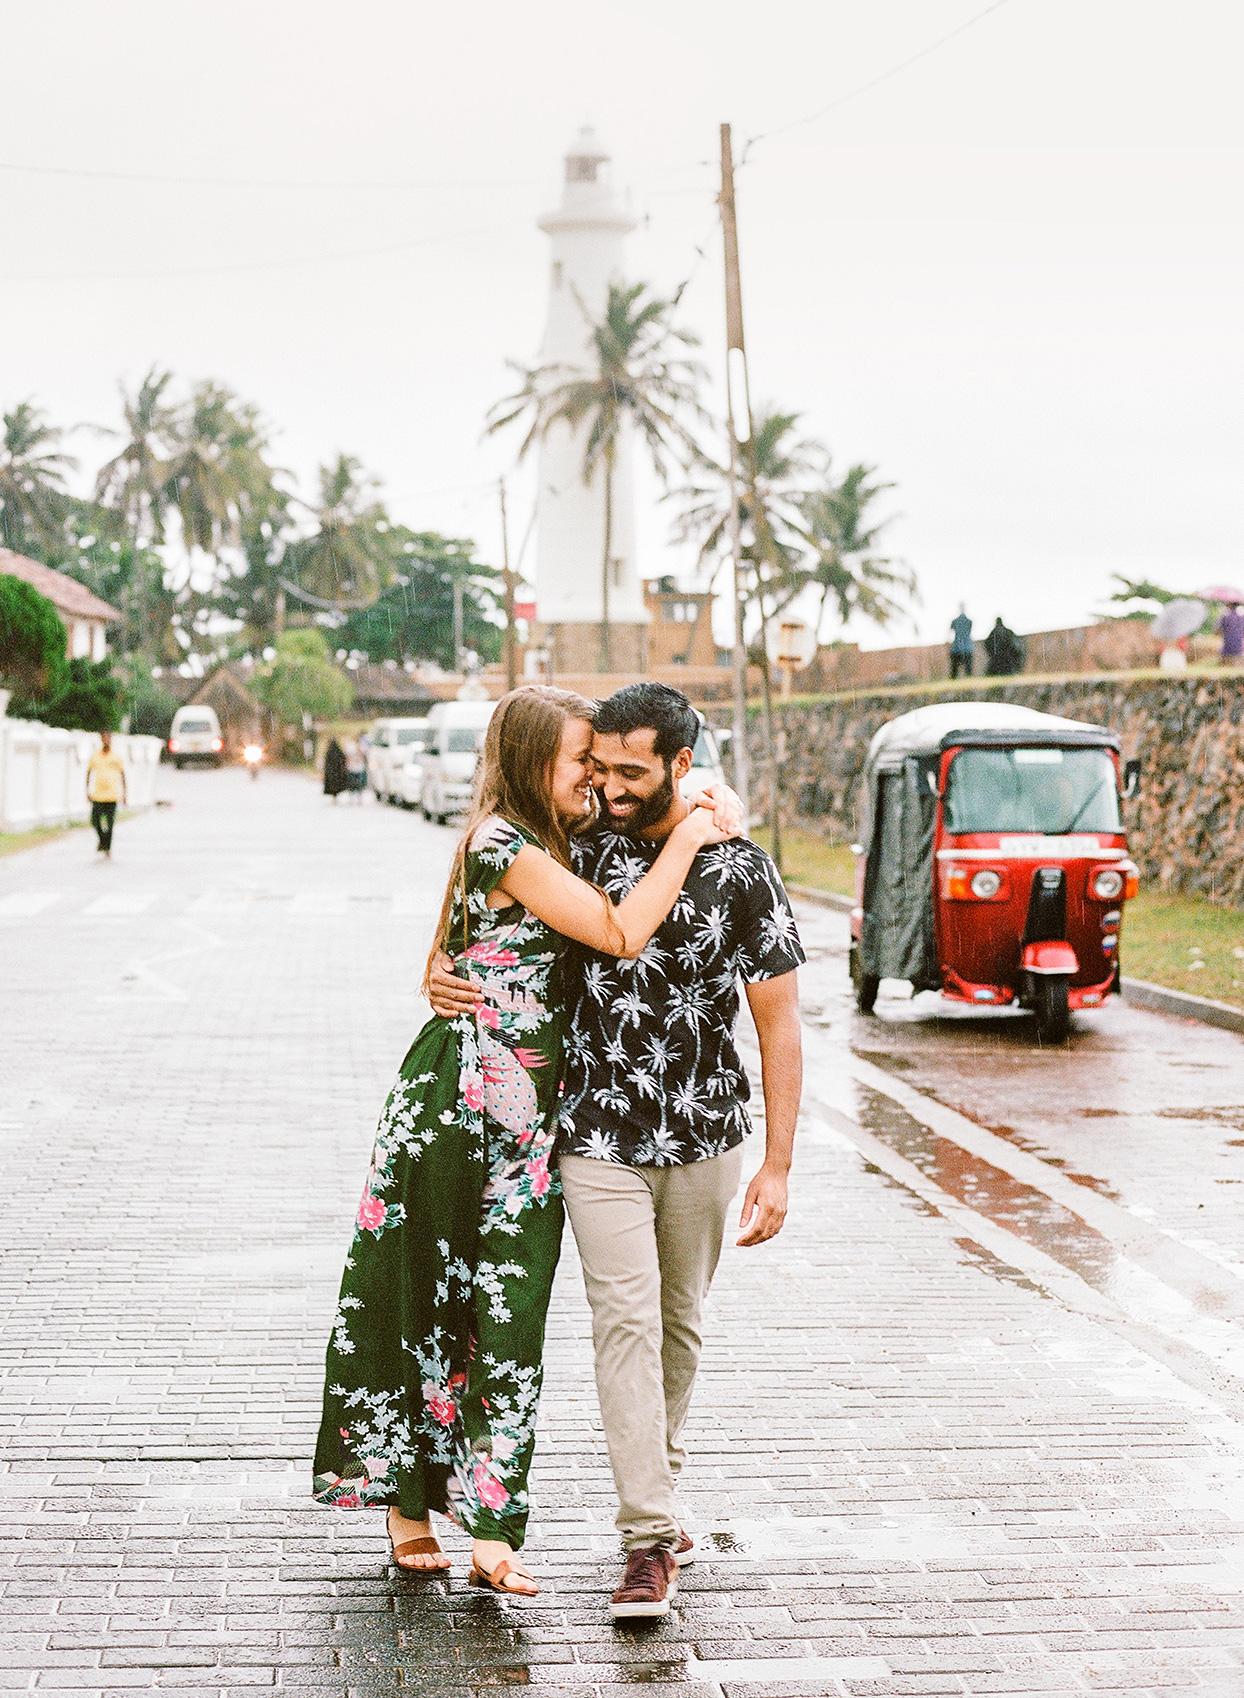 kelly sanjiv wedding couple walking in the rain